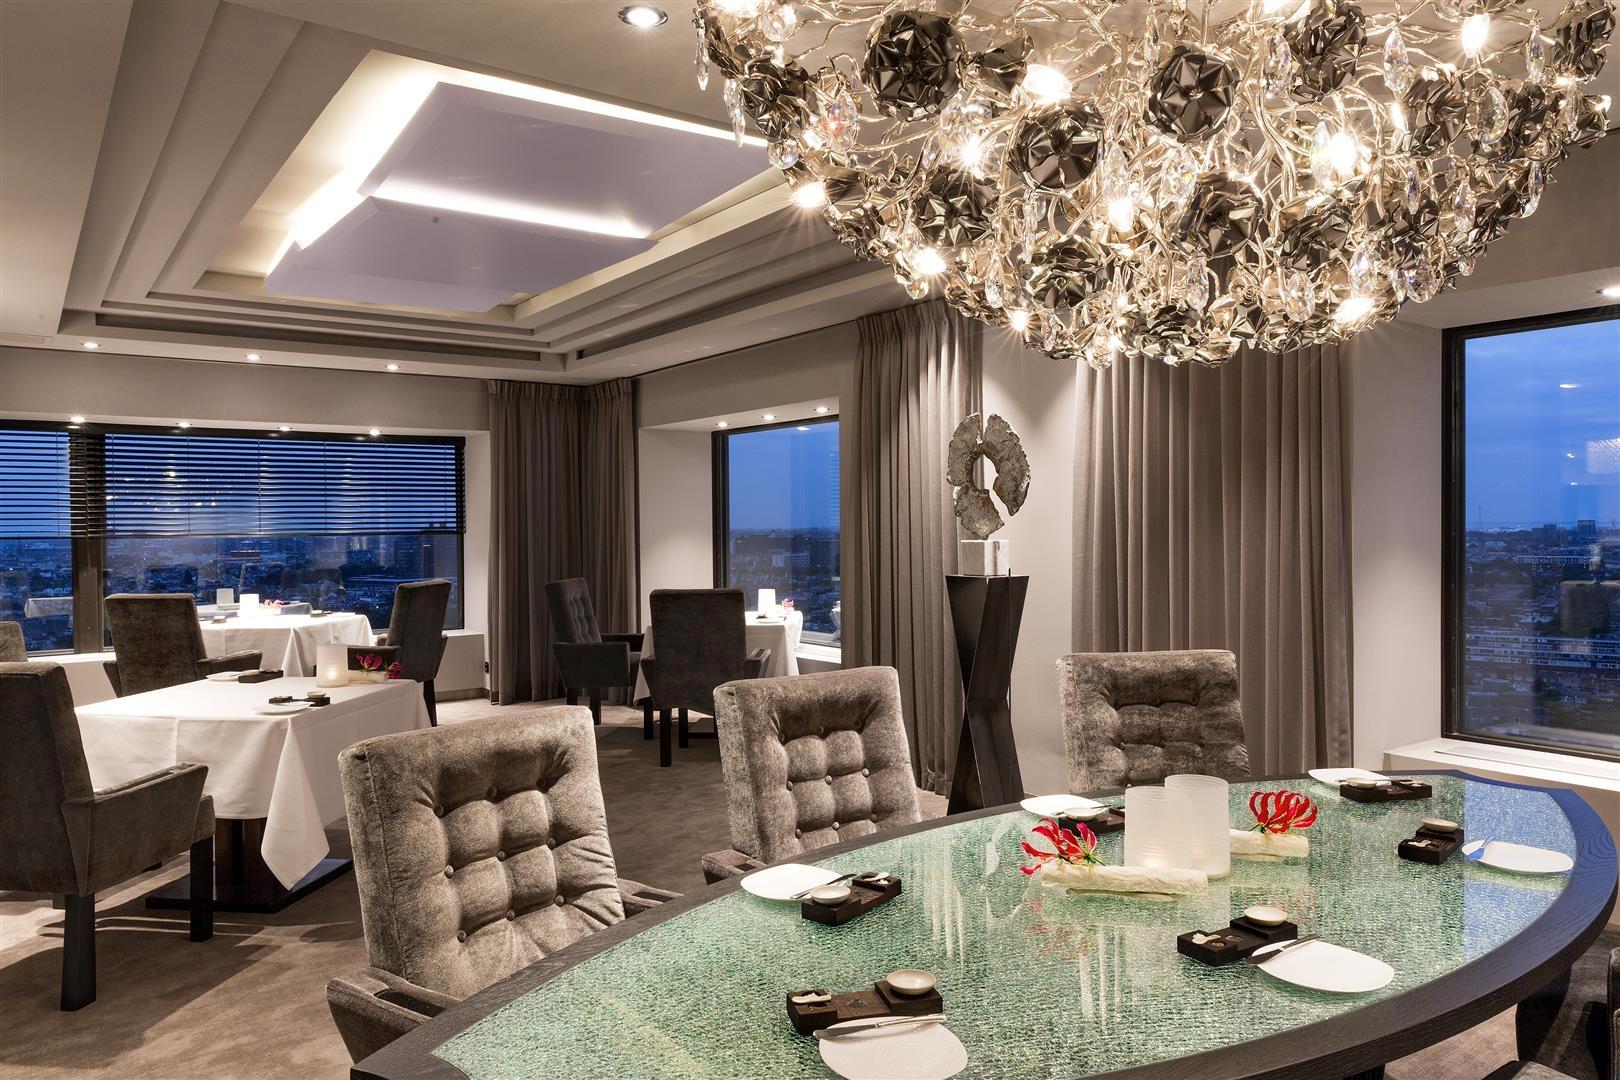 foto s vernieuwde ciel bleu misset horeca. Black Bedroom Furniture Sets. Home Design Ideas